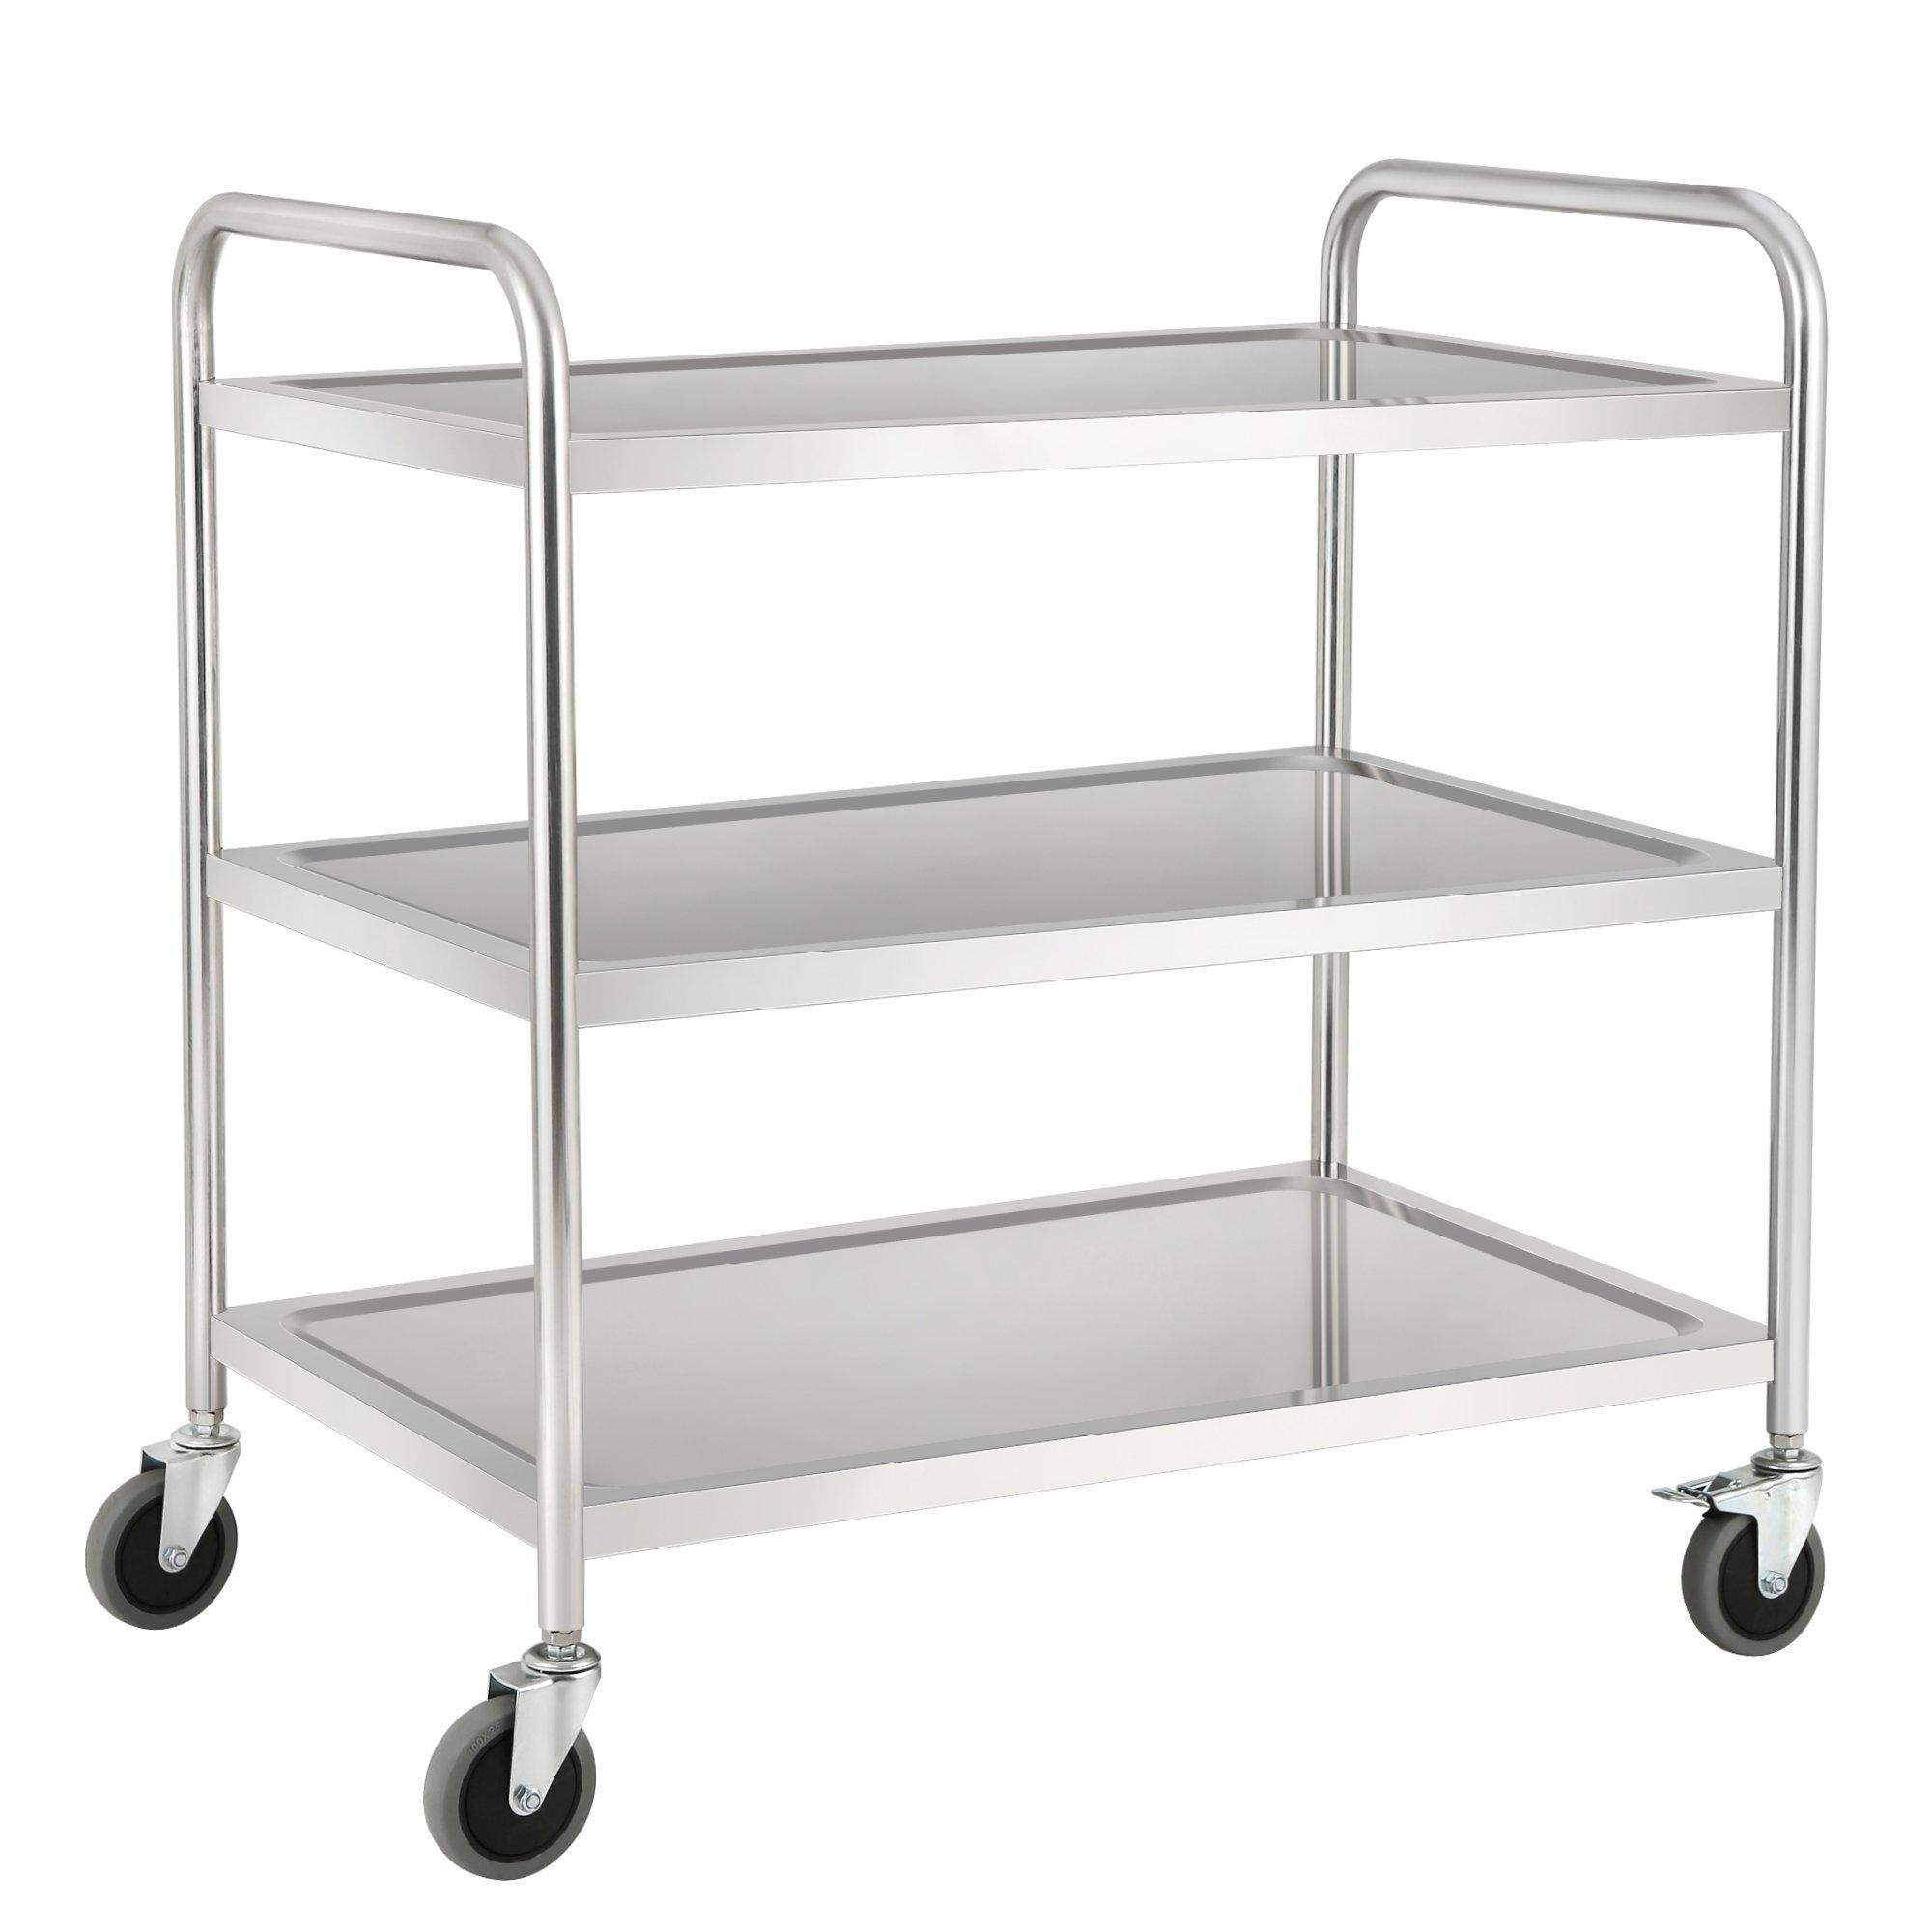 zelsius edelstahl servierwagen k chenwagen esw4 cs clever shoppen im. Black Bedroom Furniture Sets. Home Design Ideas